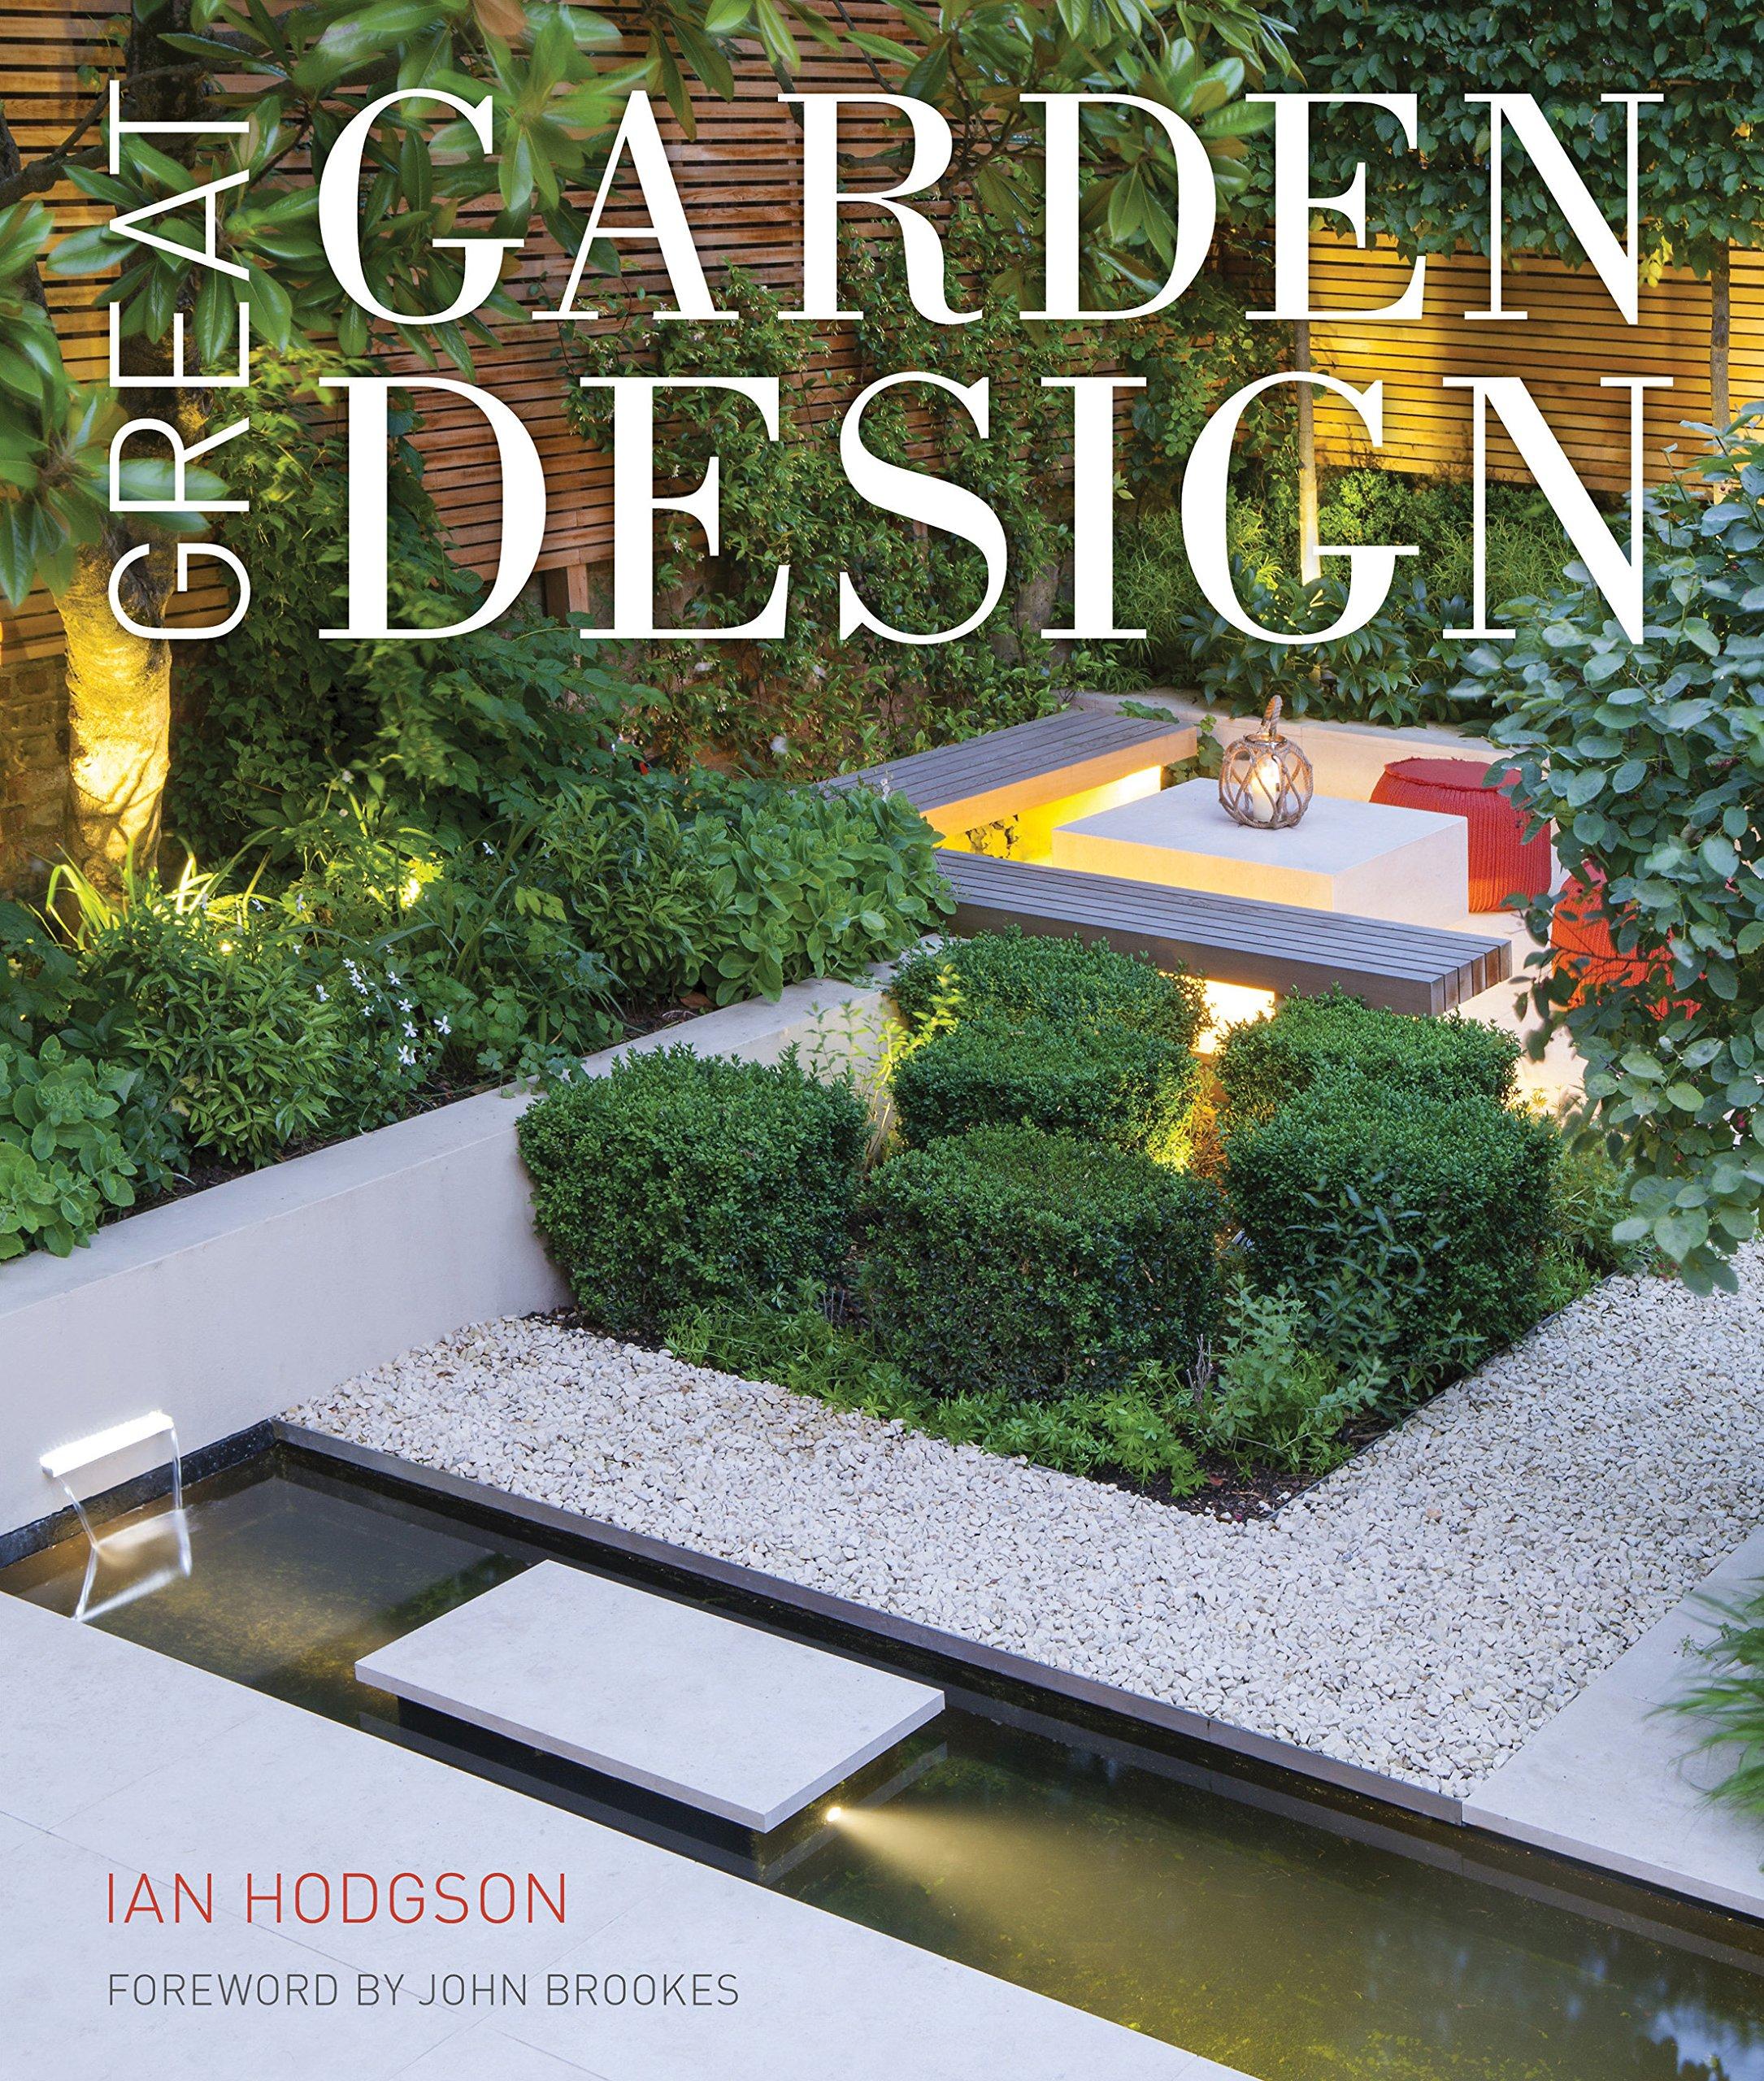 Great Garden Design: Contemporary Inspiration for Outdoor Spaces ...